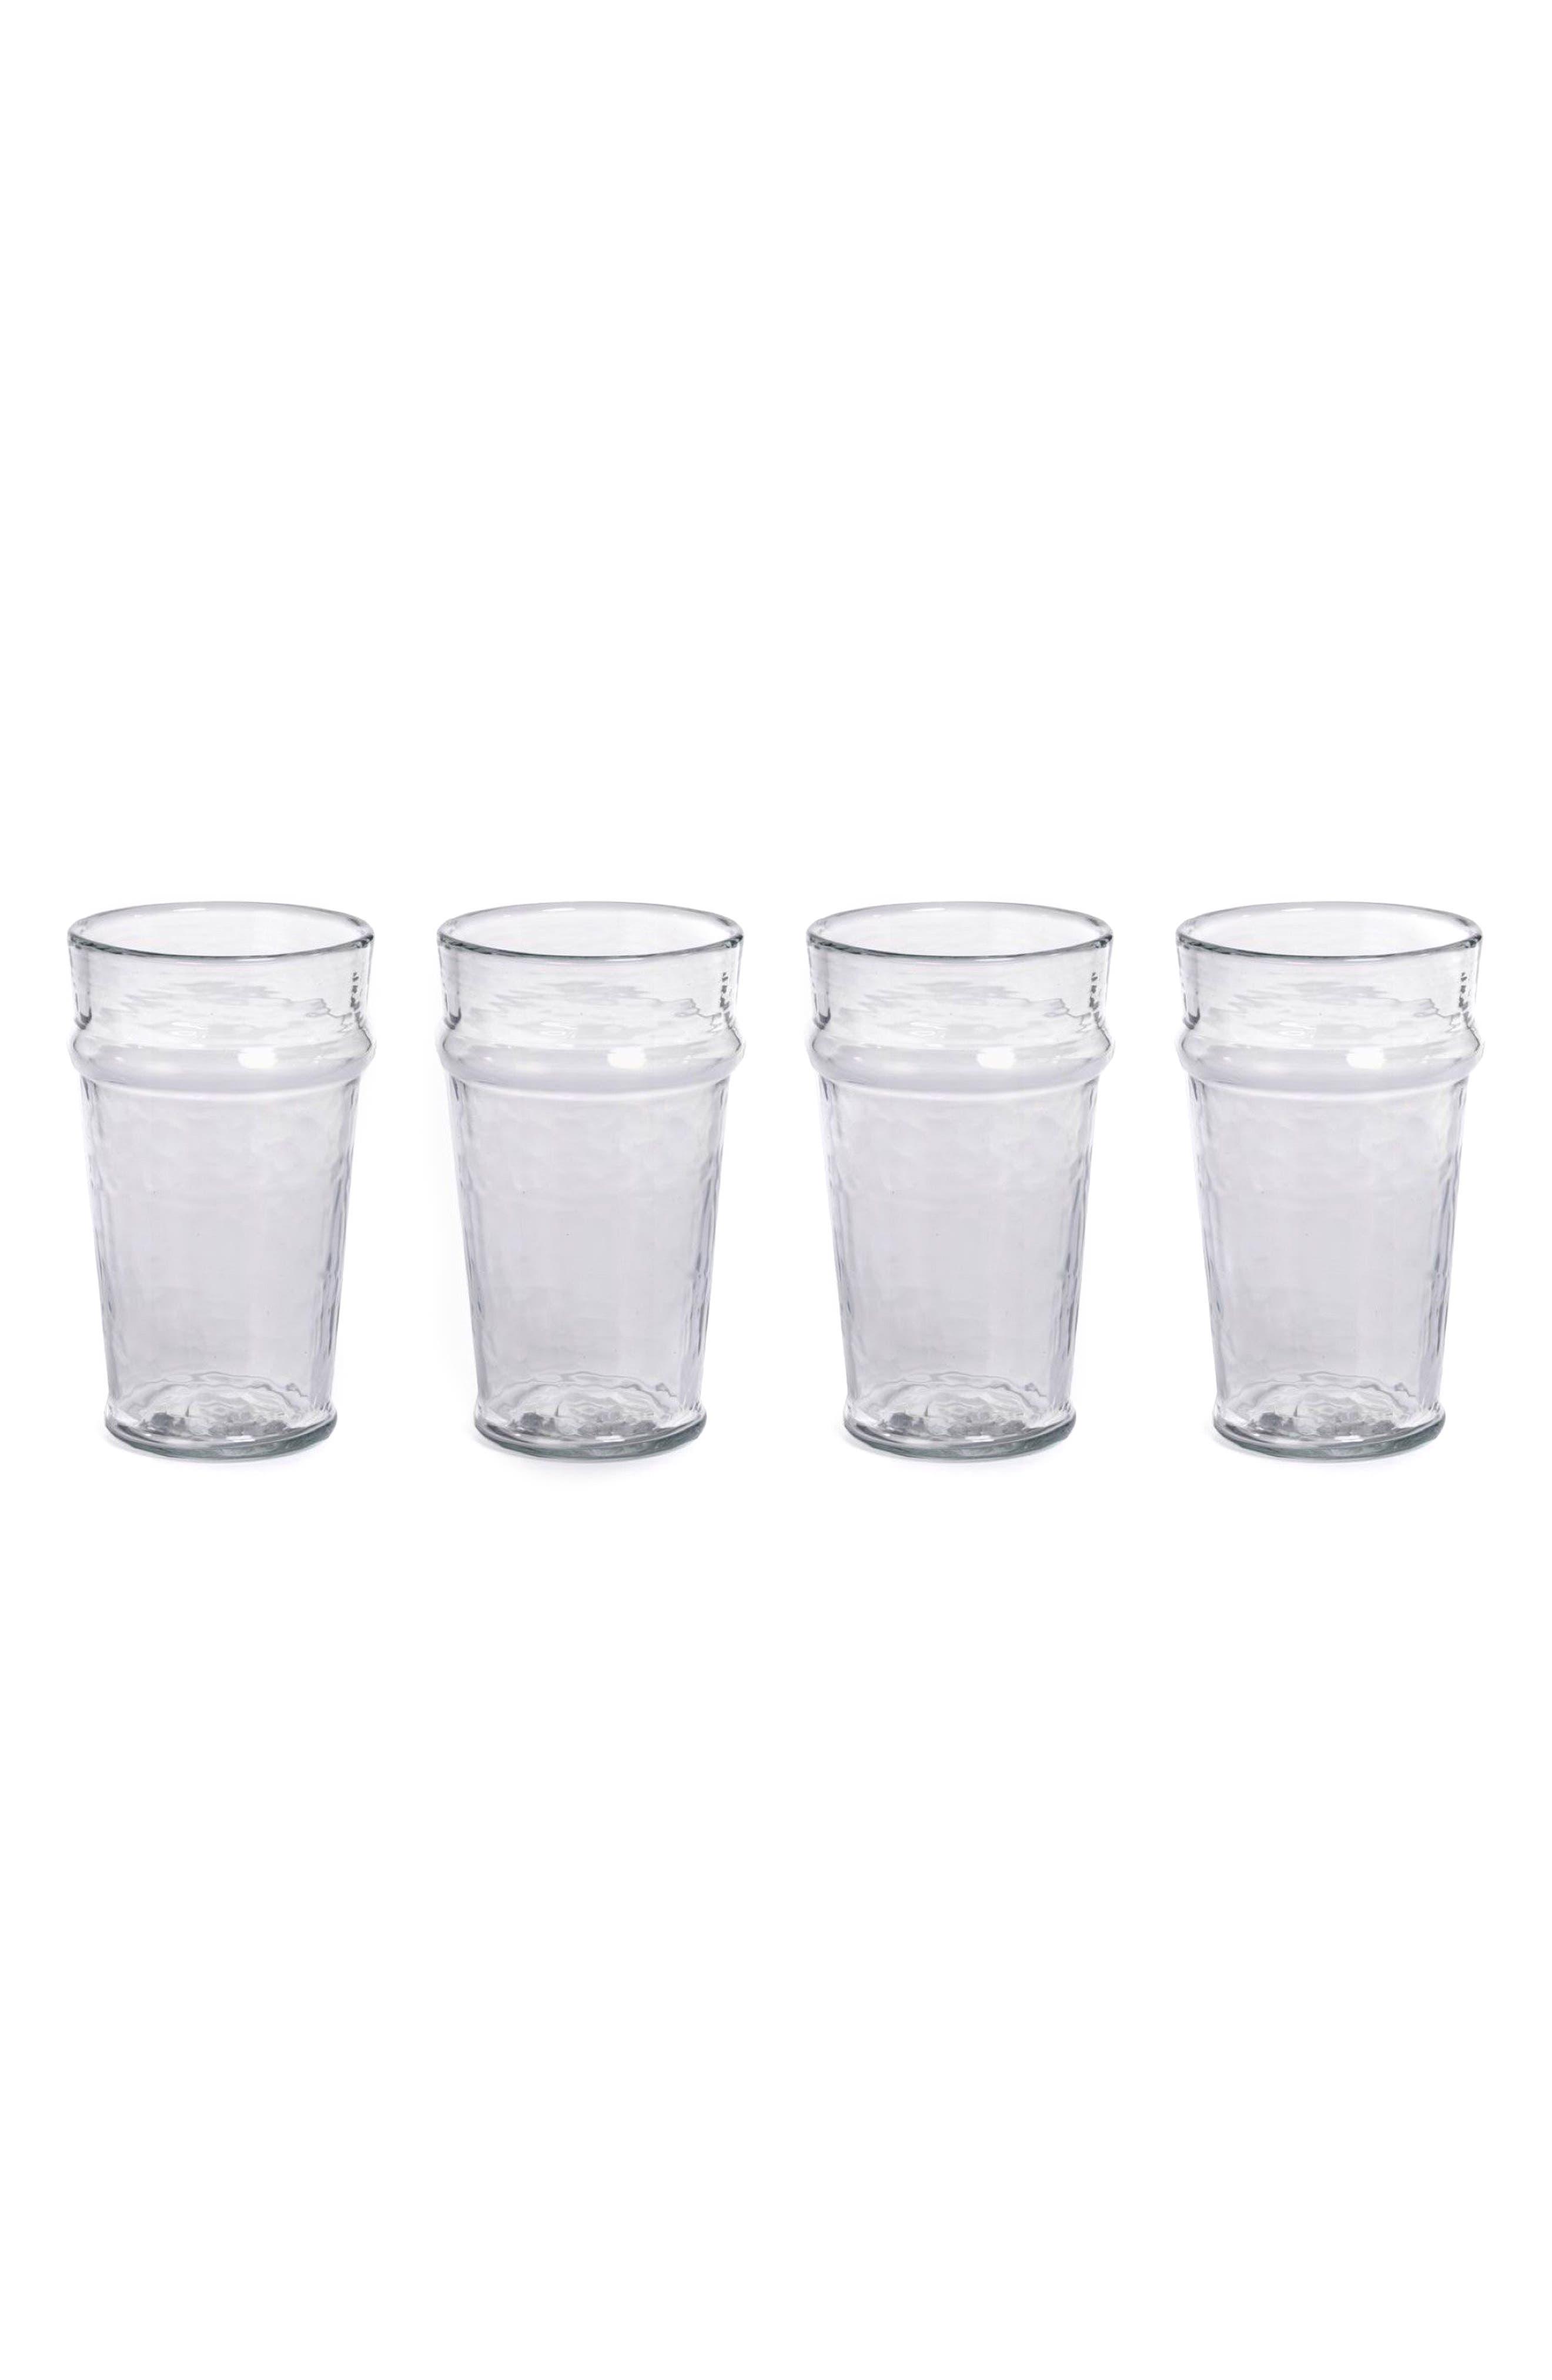 Garan Set of 4 Highball Glasses,                             Main thumbnail 1, color,                             Clear